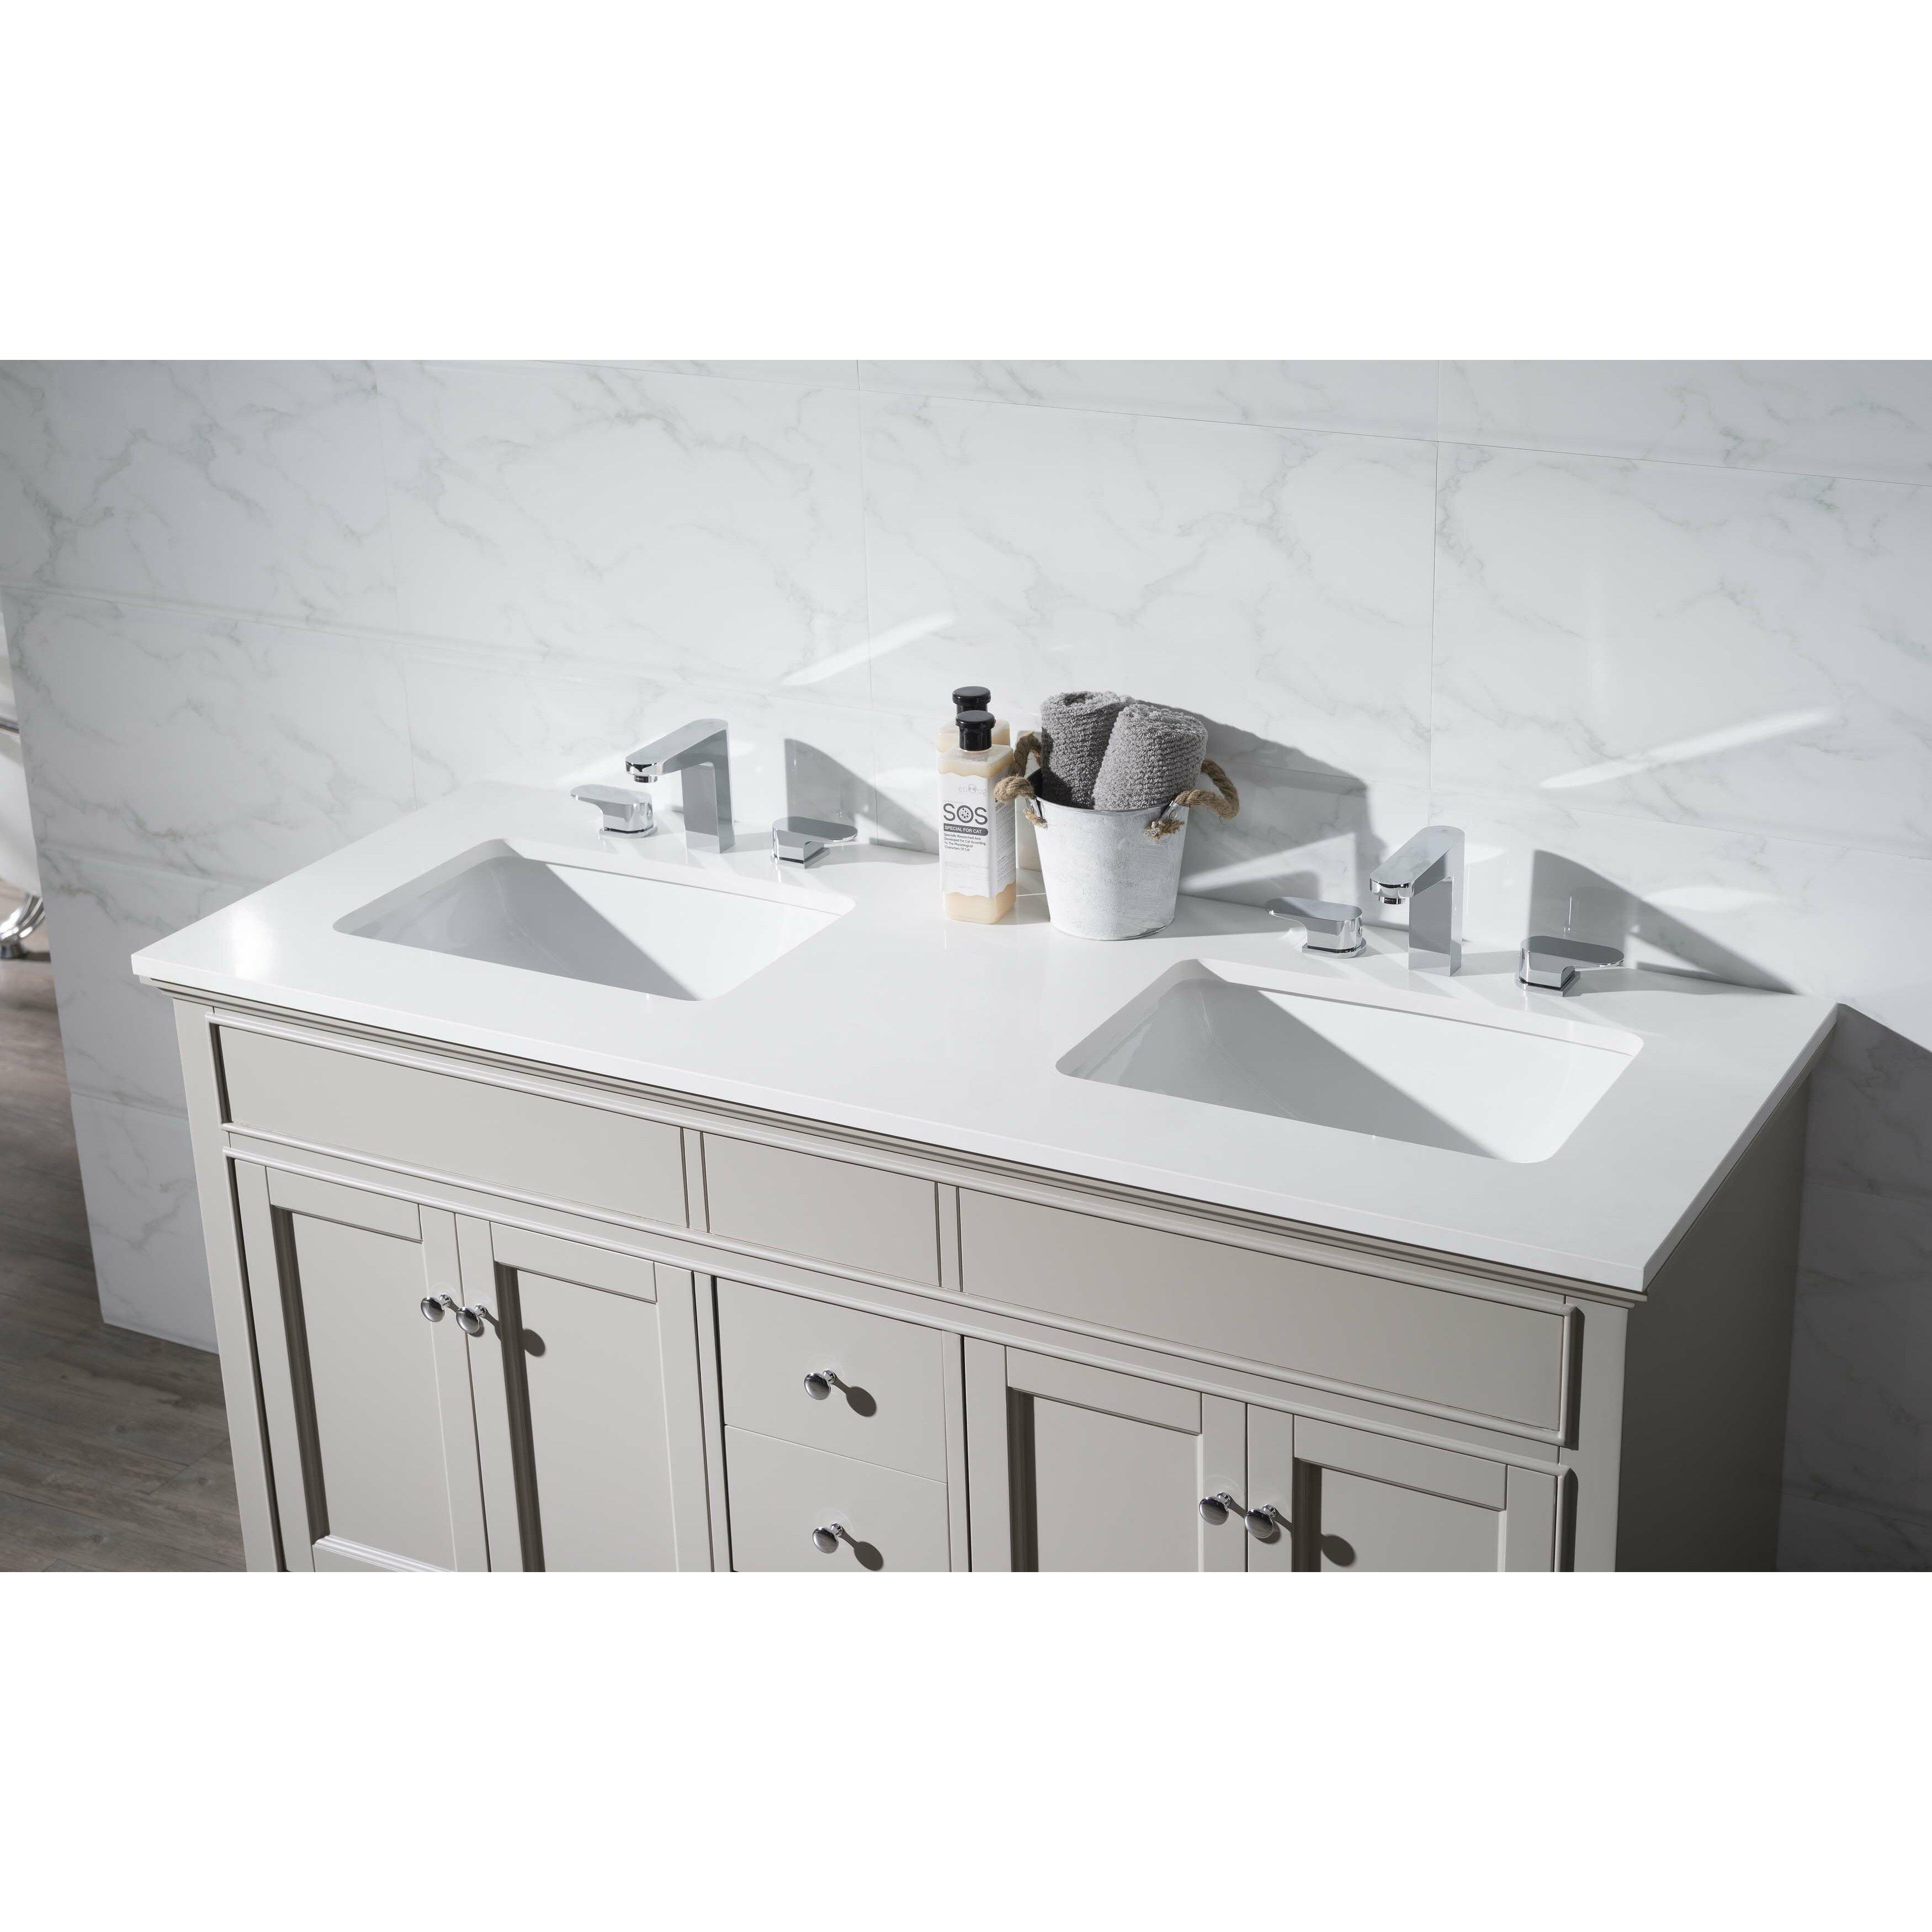 Dcor Design Leola 59 Double Sink Bathroom Vanity Set Reviews Wayfair